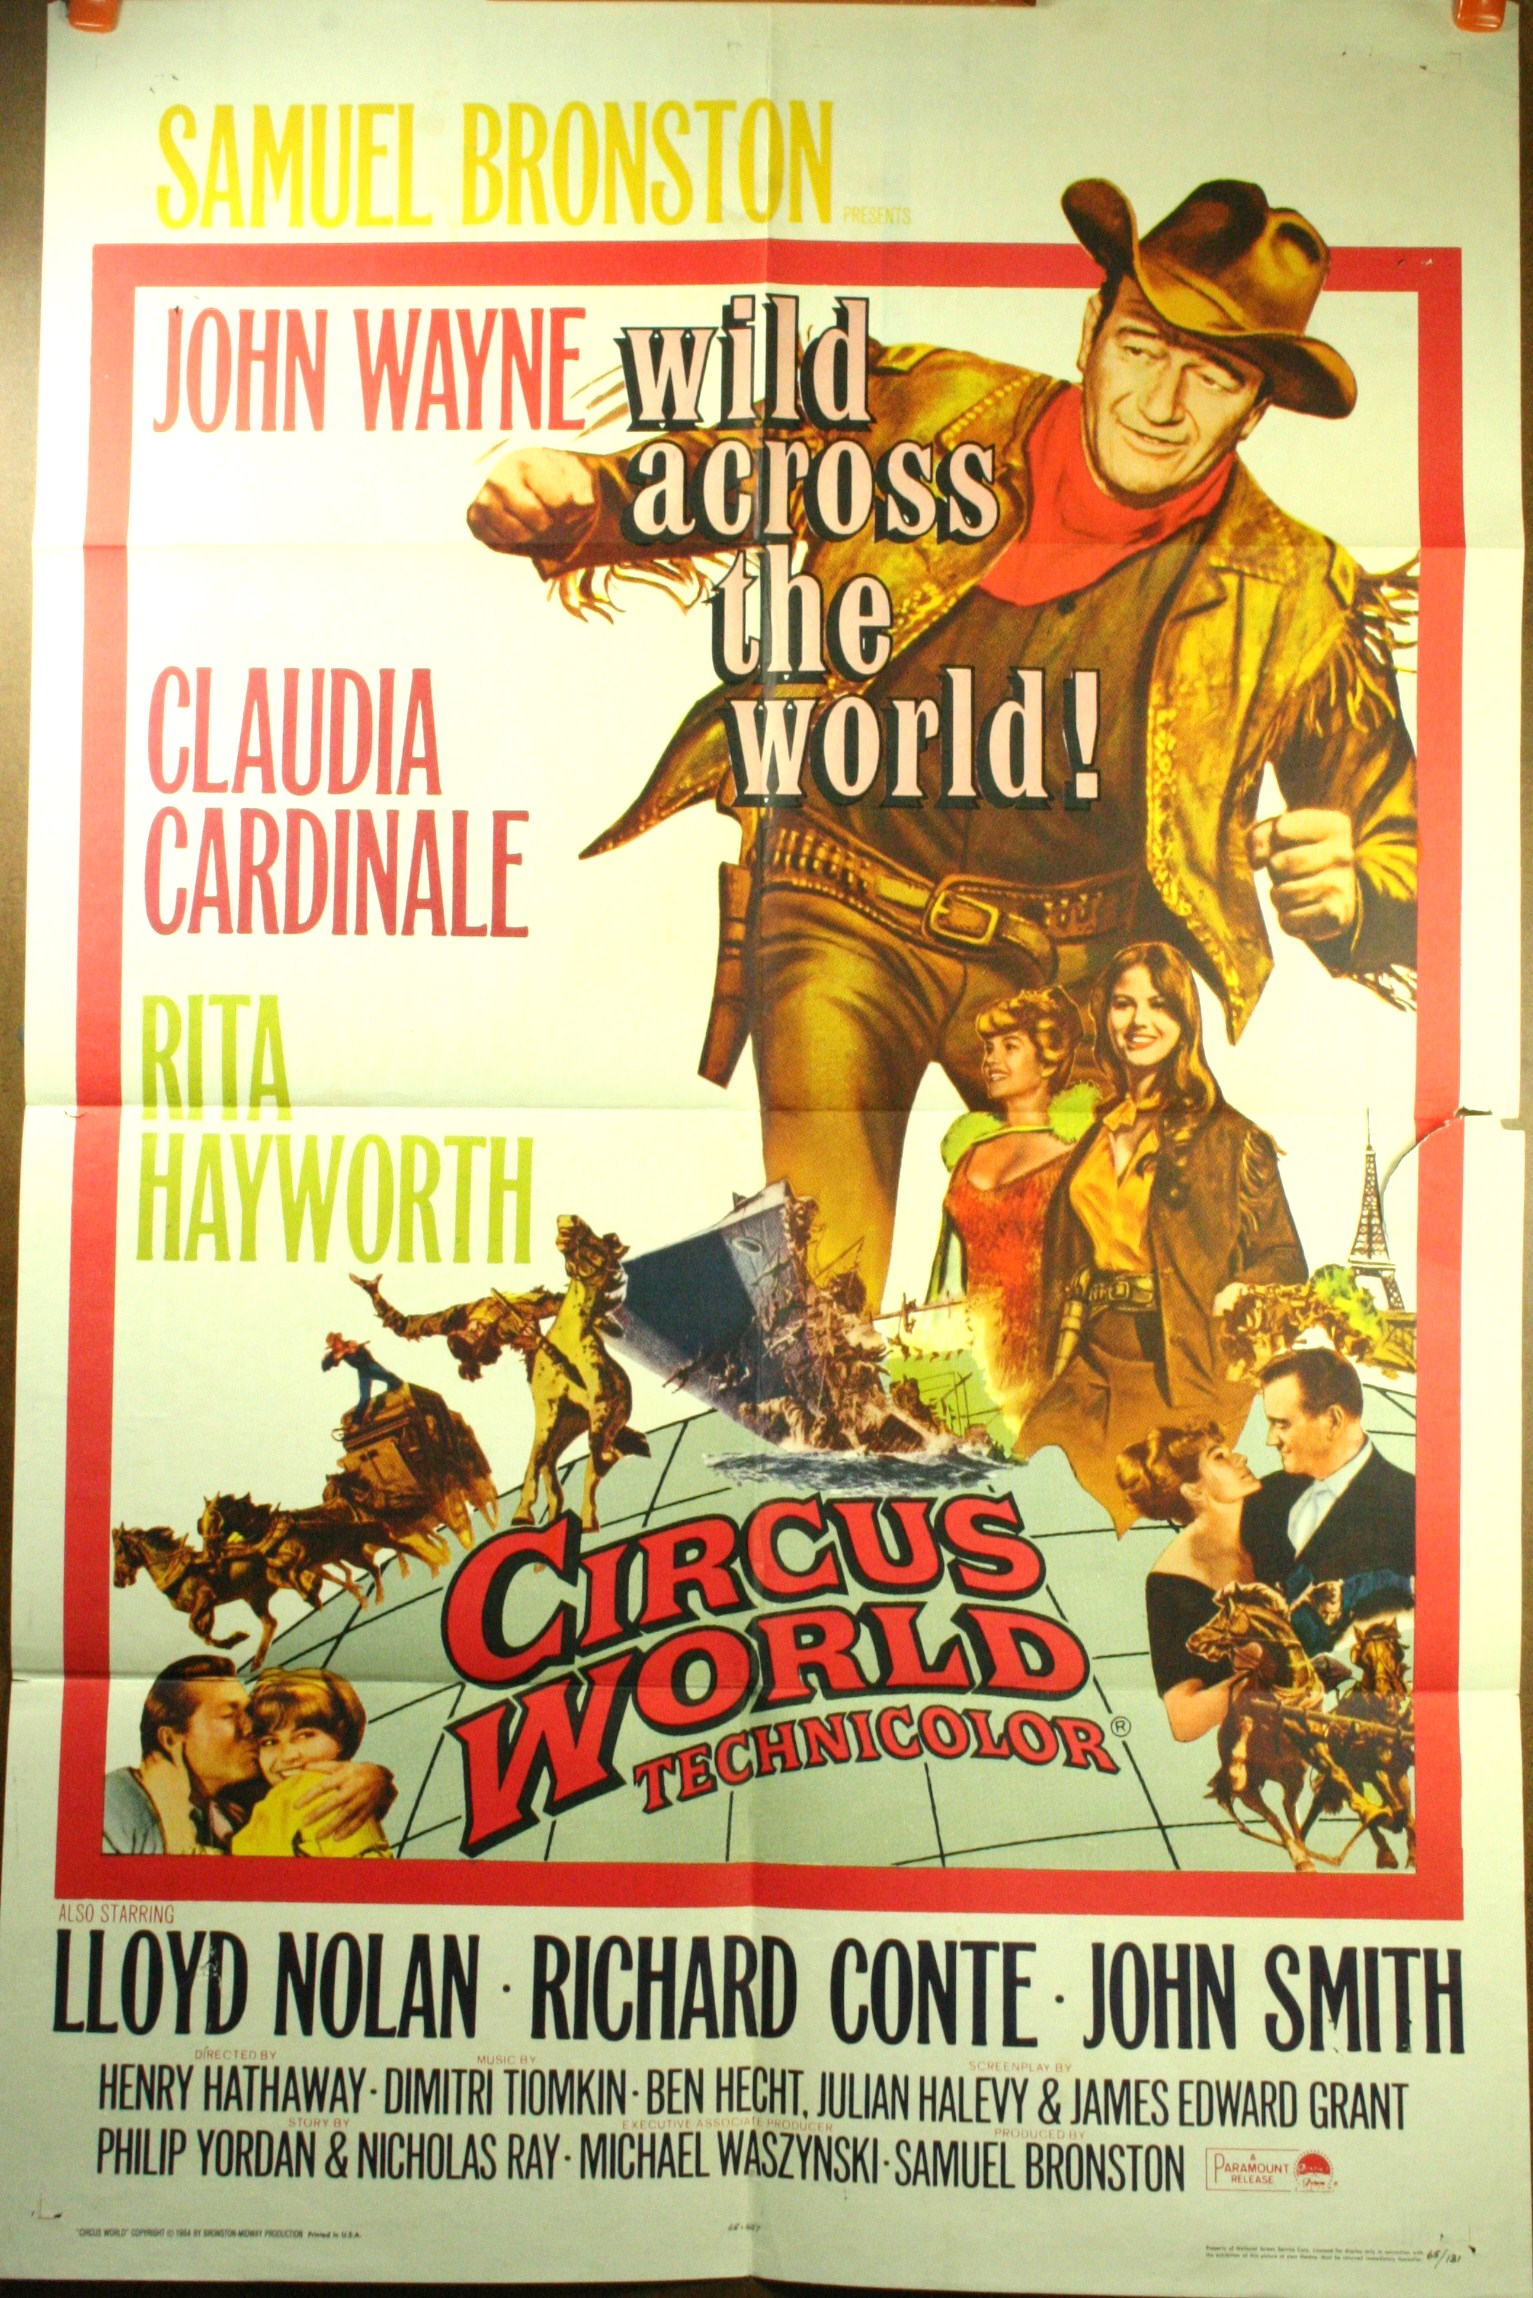 John wayne movie poster original 1 sheet movie poster